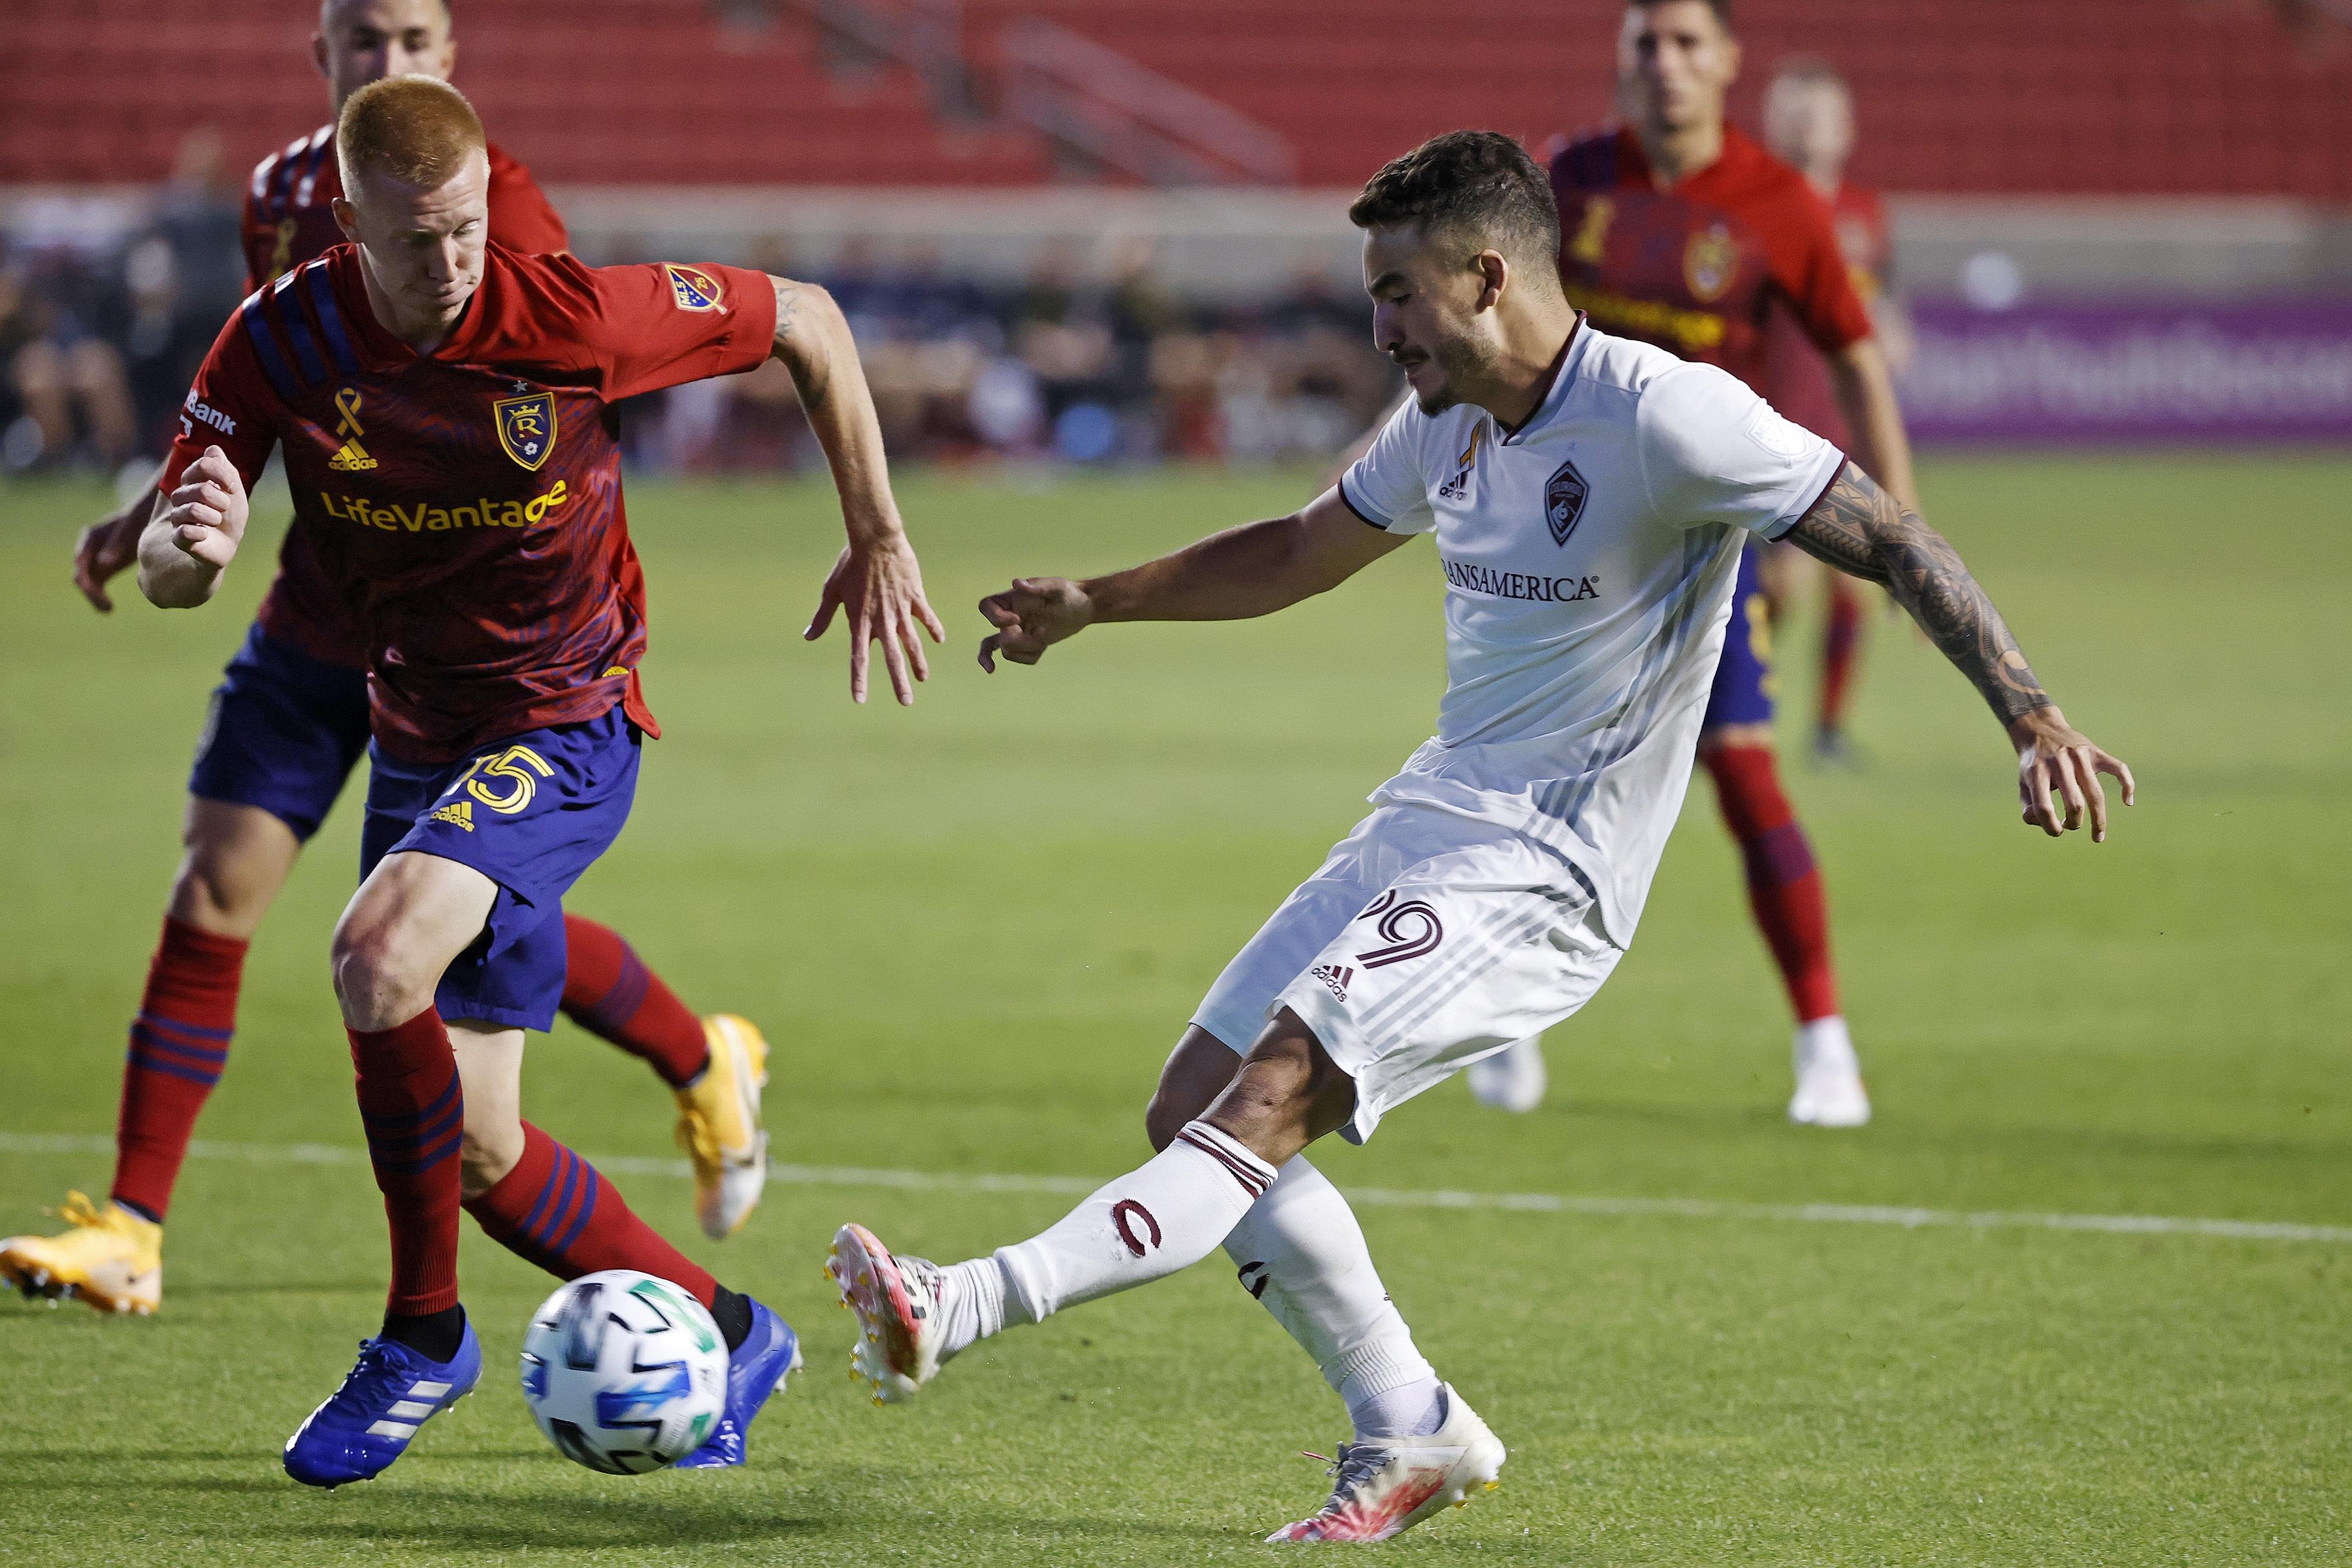 Rapids to Stream Upcoming Preseason Matches Against Real Salt Lake, LA Galaxy | Colorado Rapids